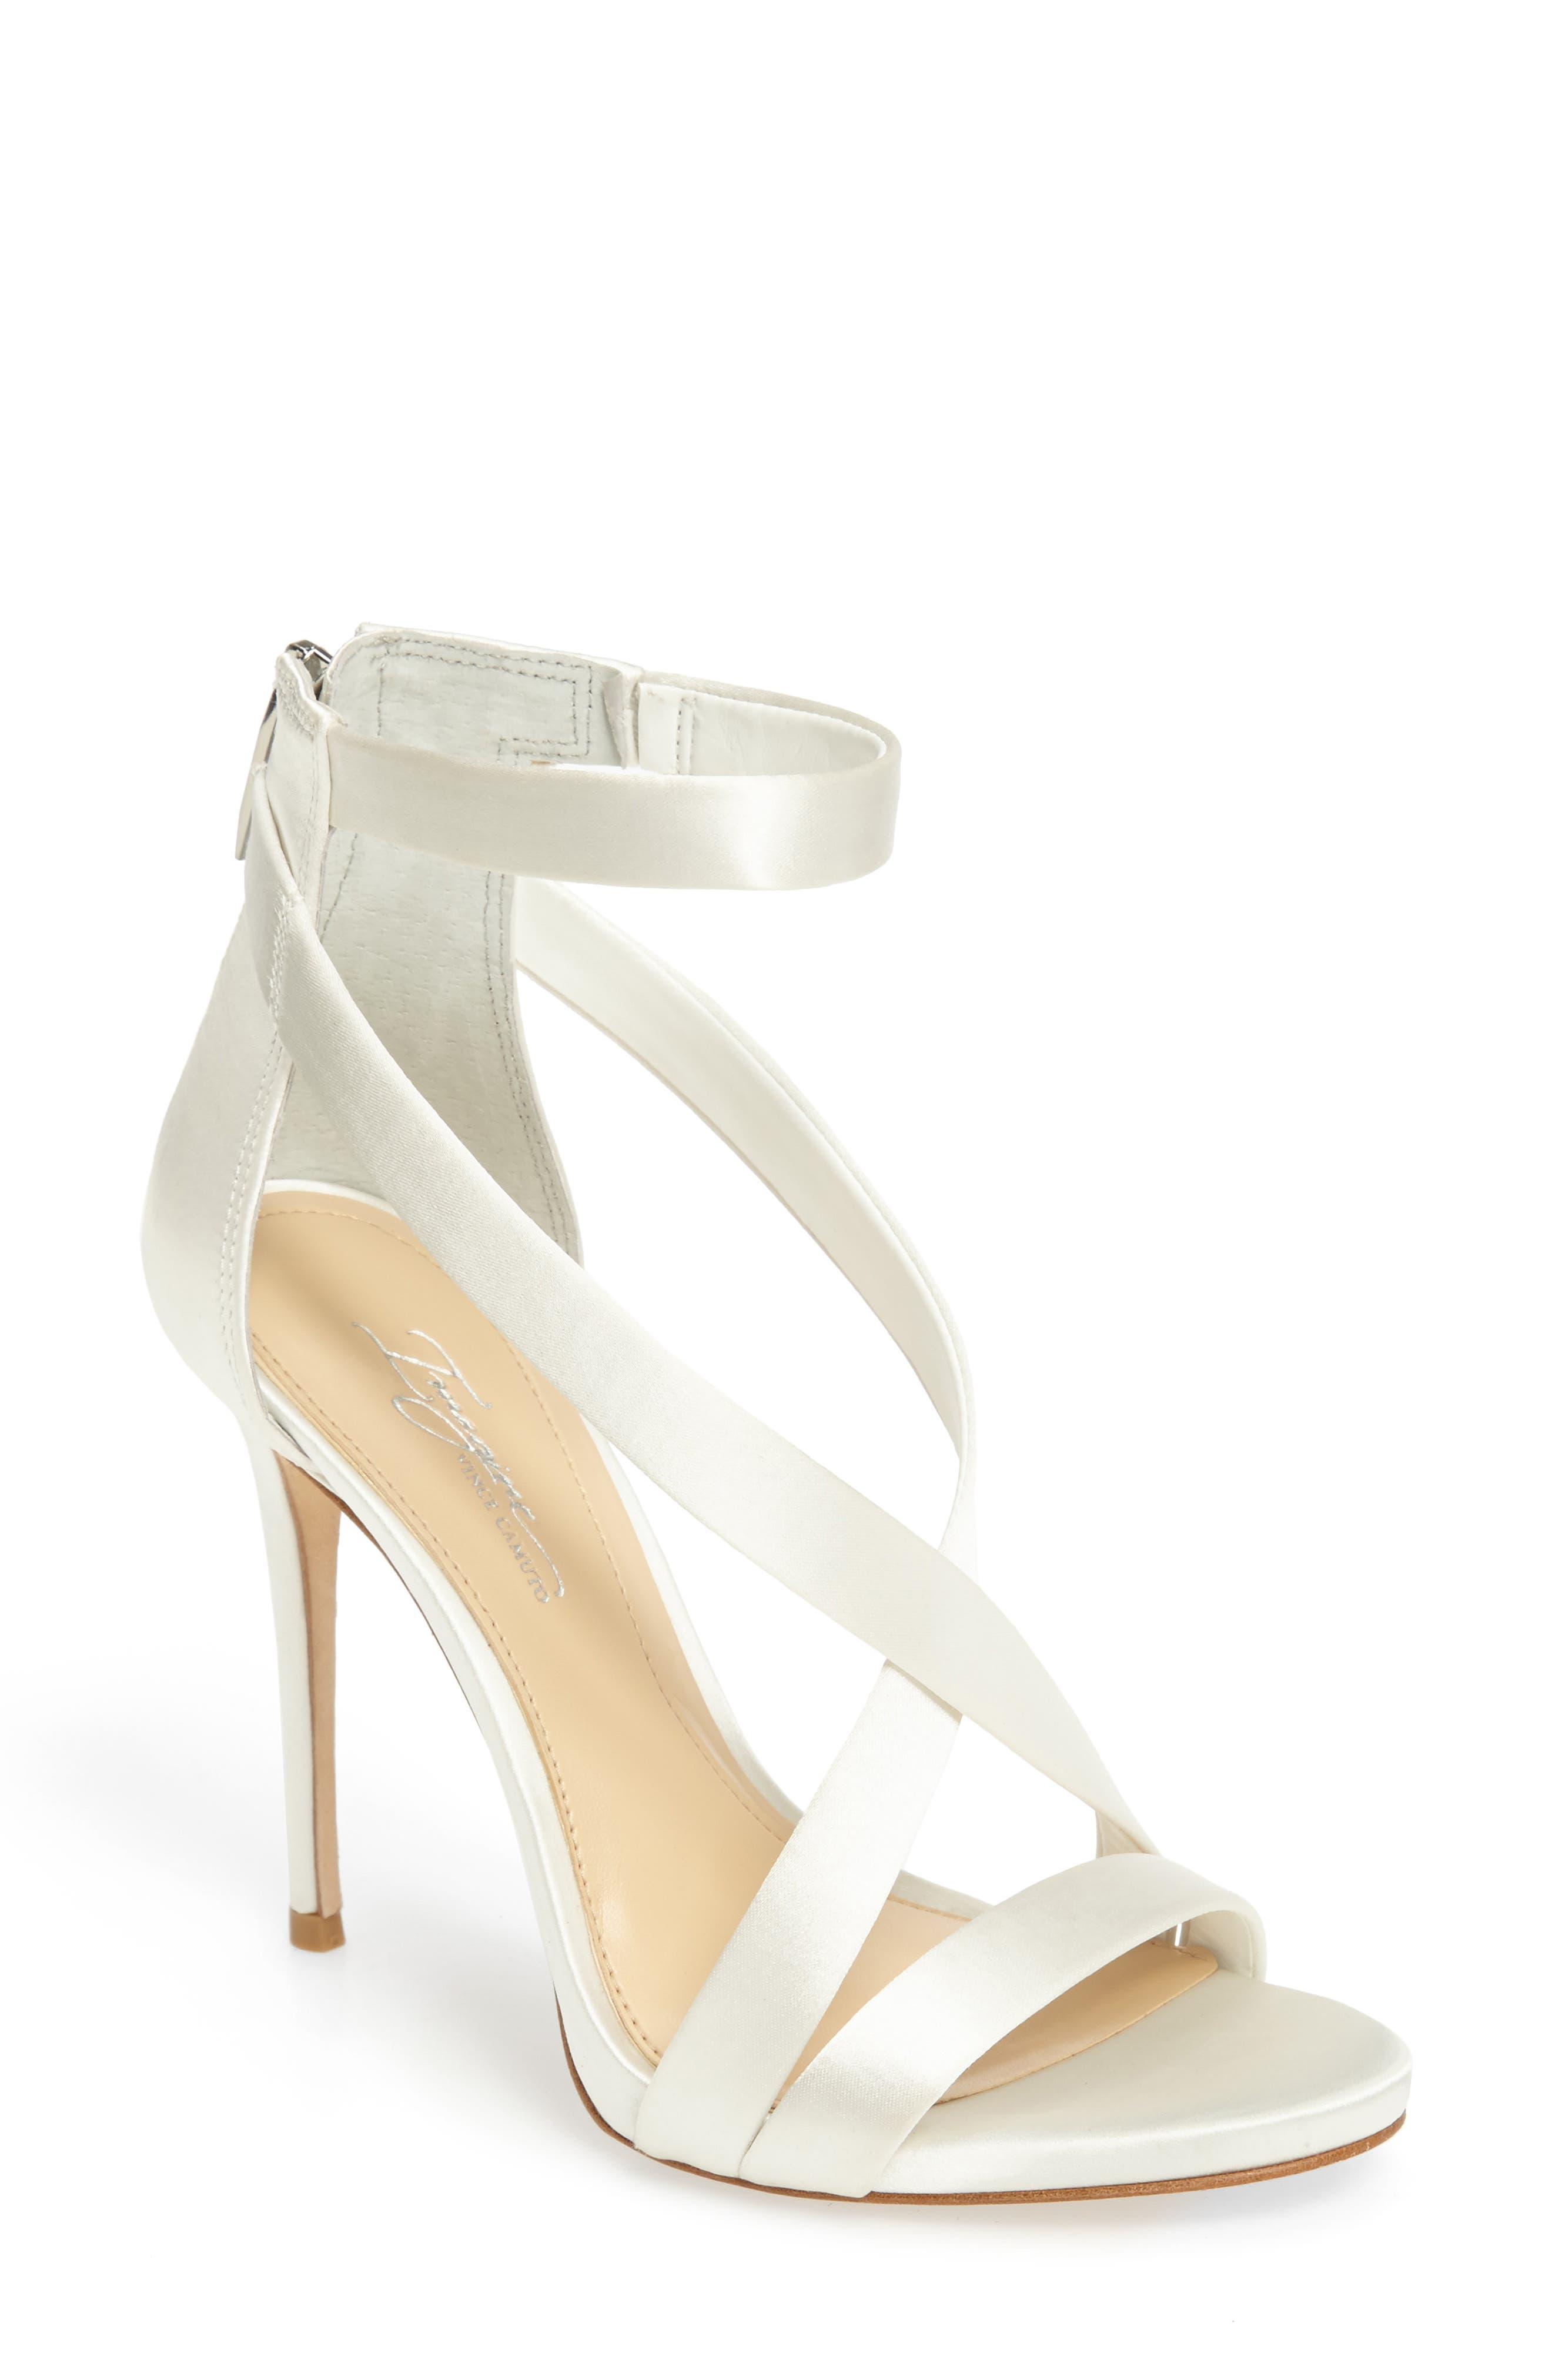 IMAGINE BY VINCE CAMUTO Imagine Vince Camuto 'Devin' Sandal, Main, color, PURE WHITE SATIN